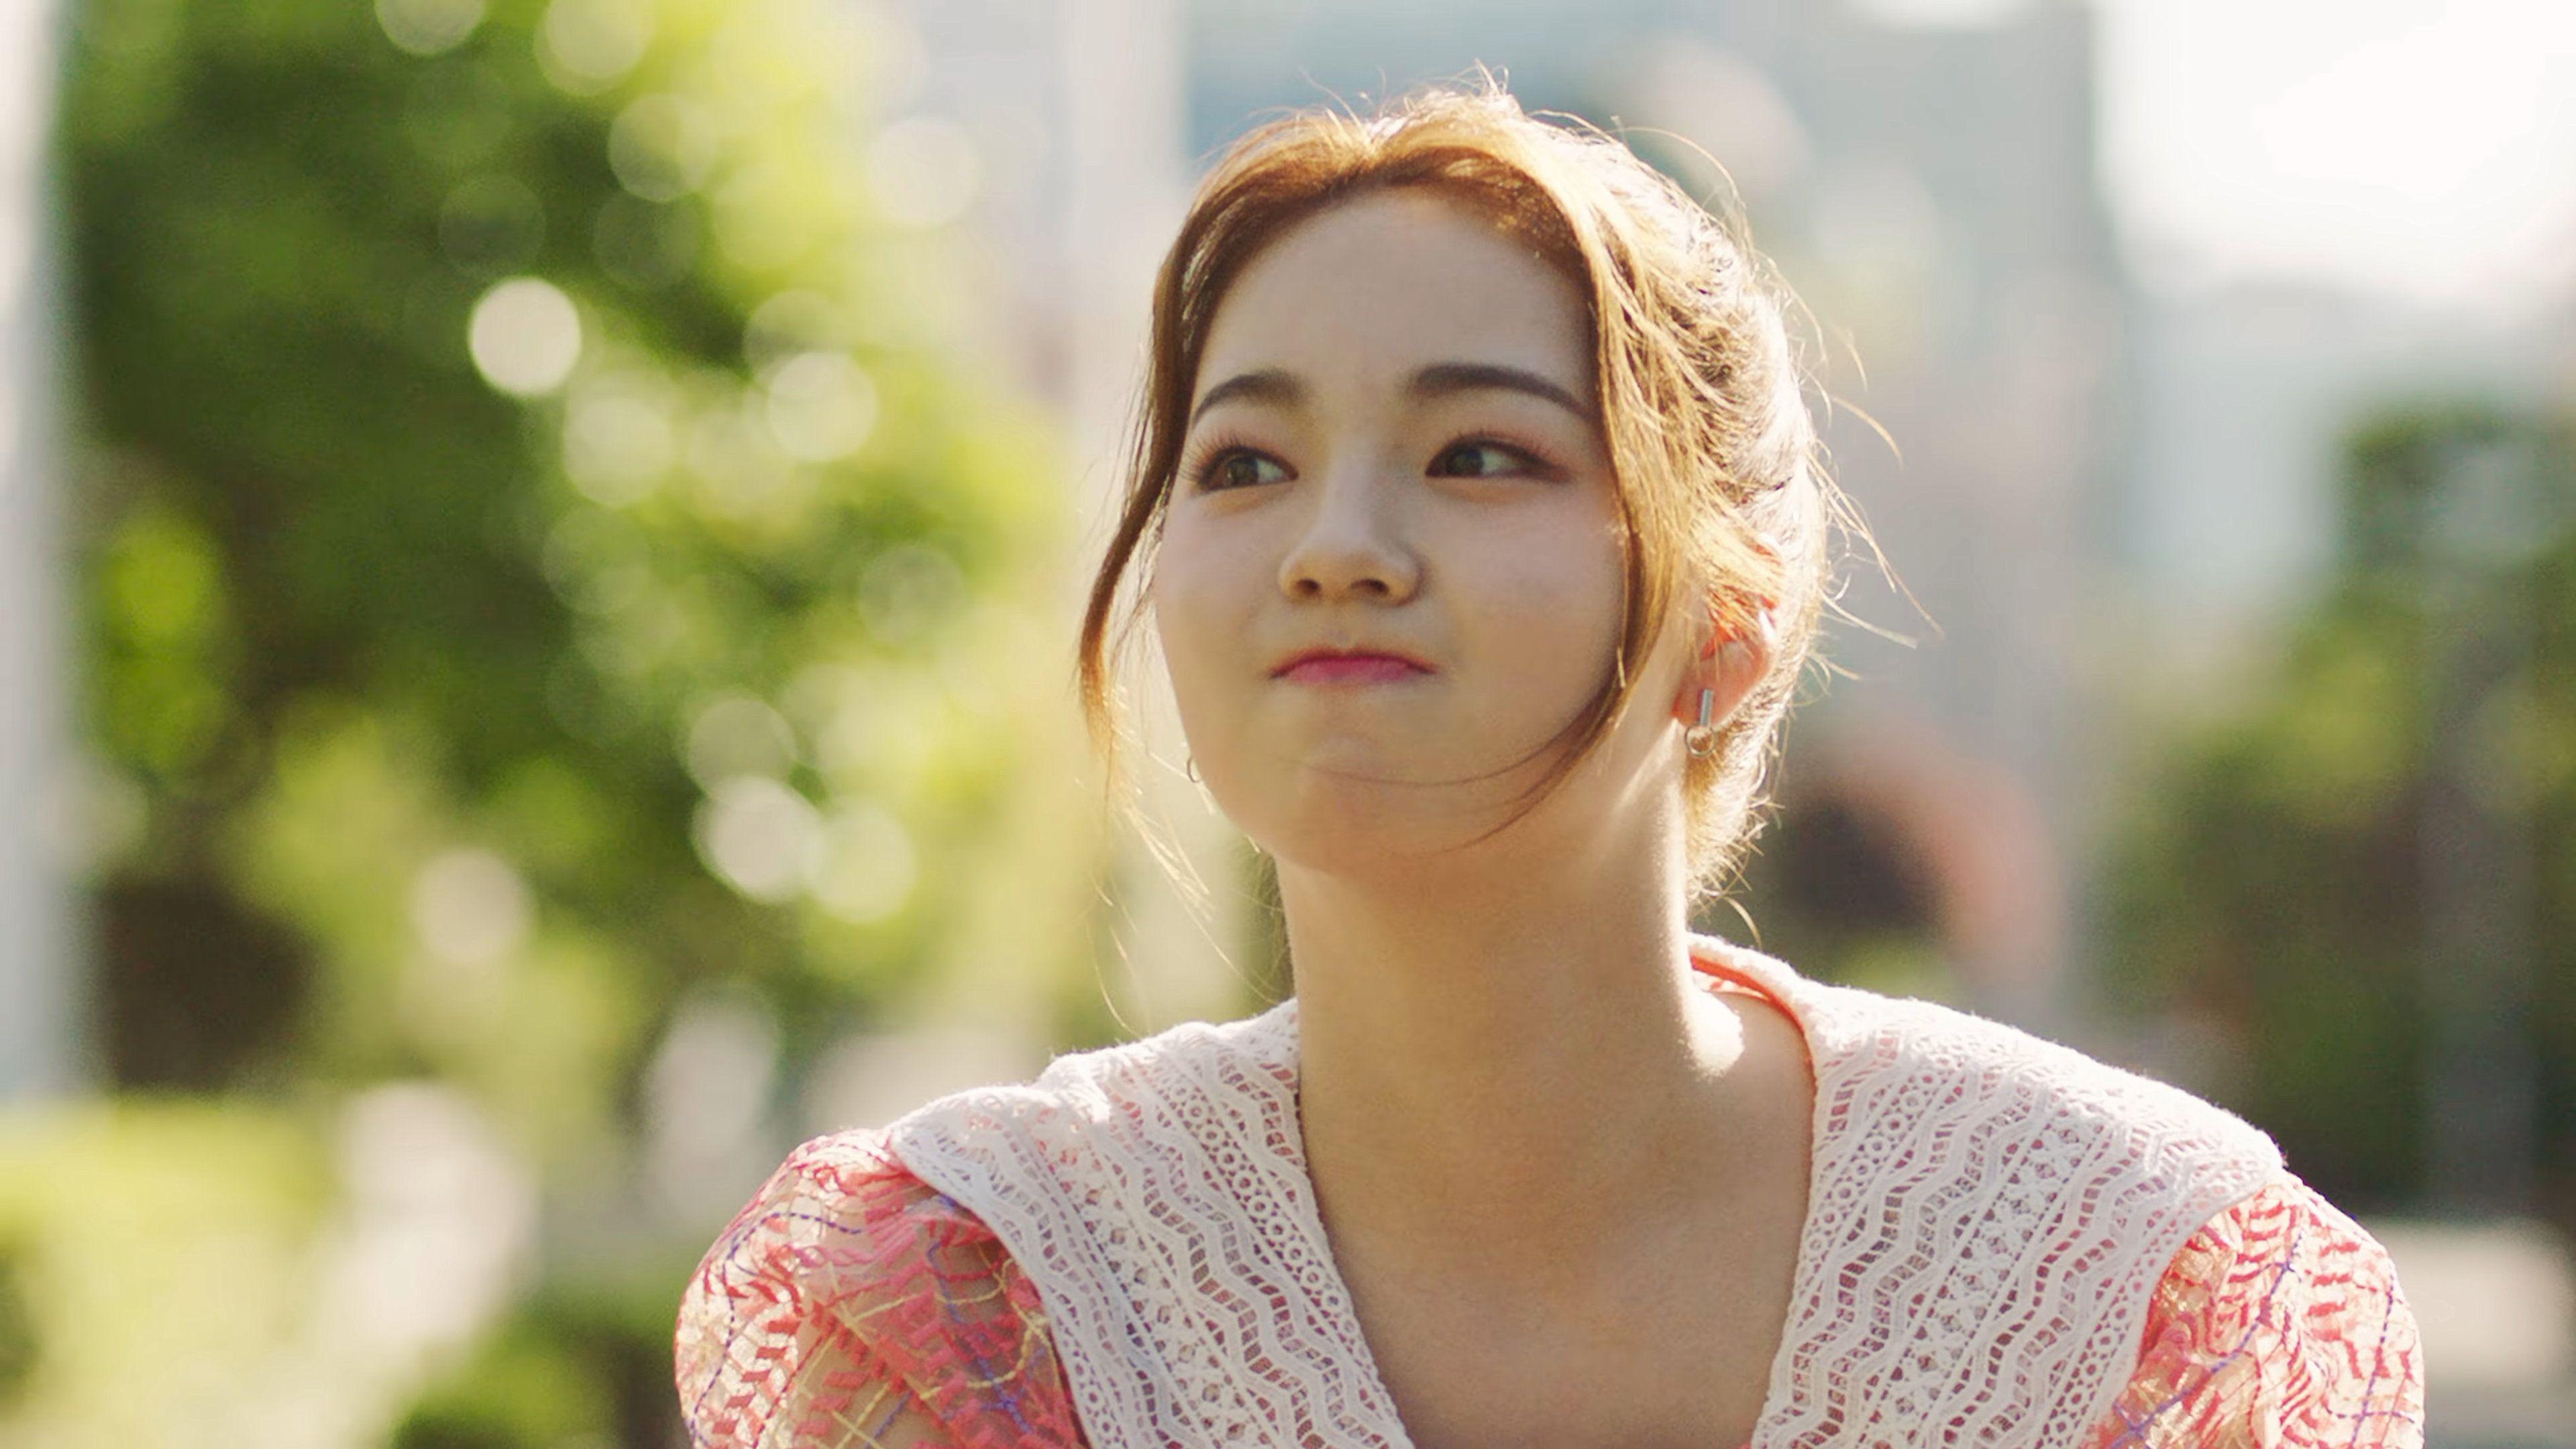 NiziU Make You Happy MV and who's who | Are you happy, Japanese ...